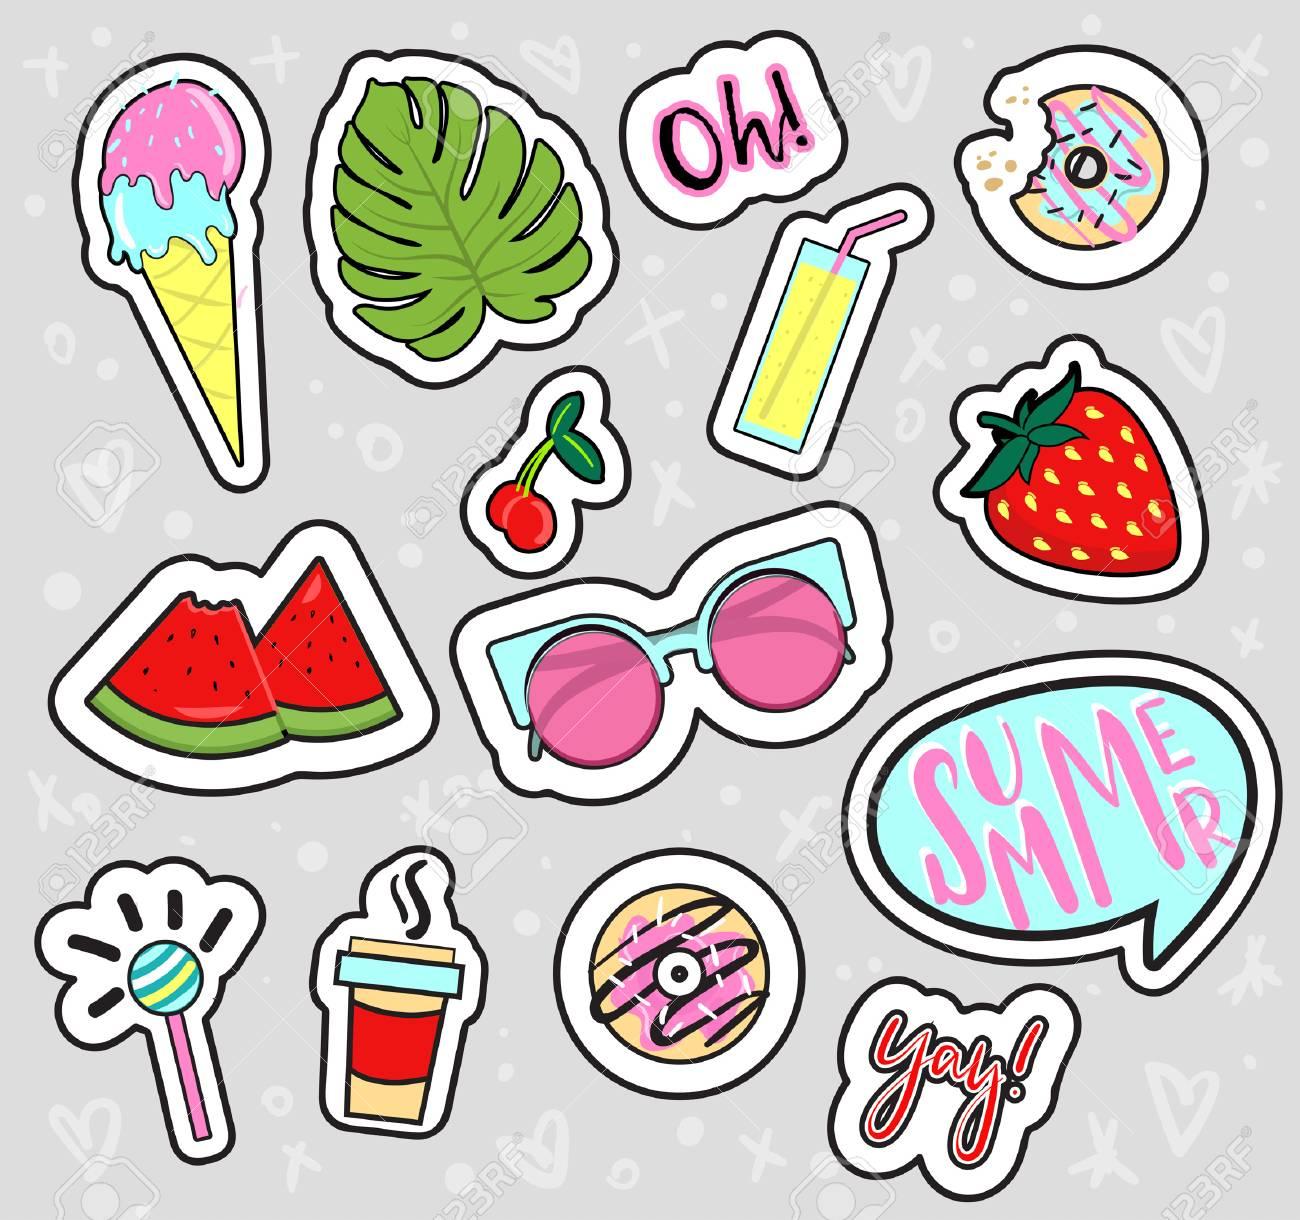 Conjunto De Parches De Verano Dibujados A Mano Pegatinas Insignias Fresa Hoja De Palma Jugo Cóctel Gafas De Sol Helados Donuts Café Frases